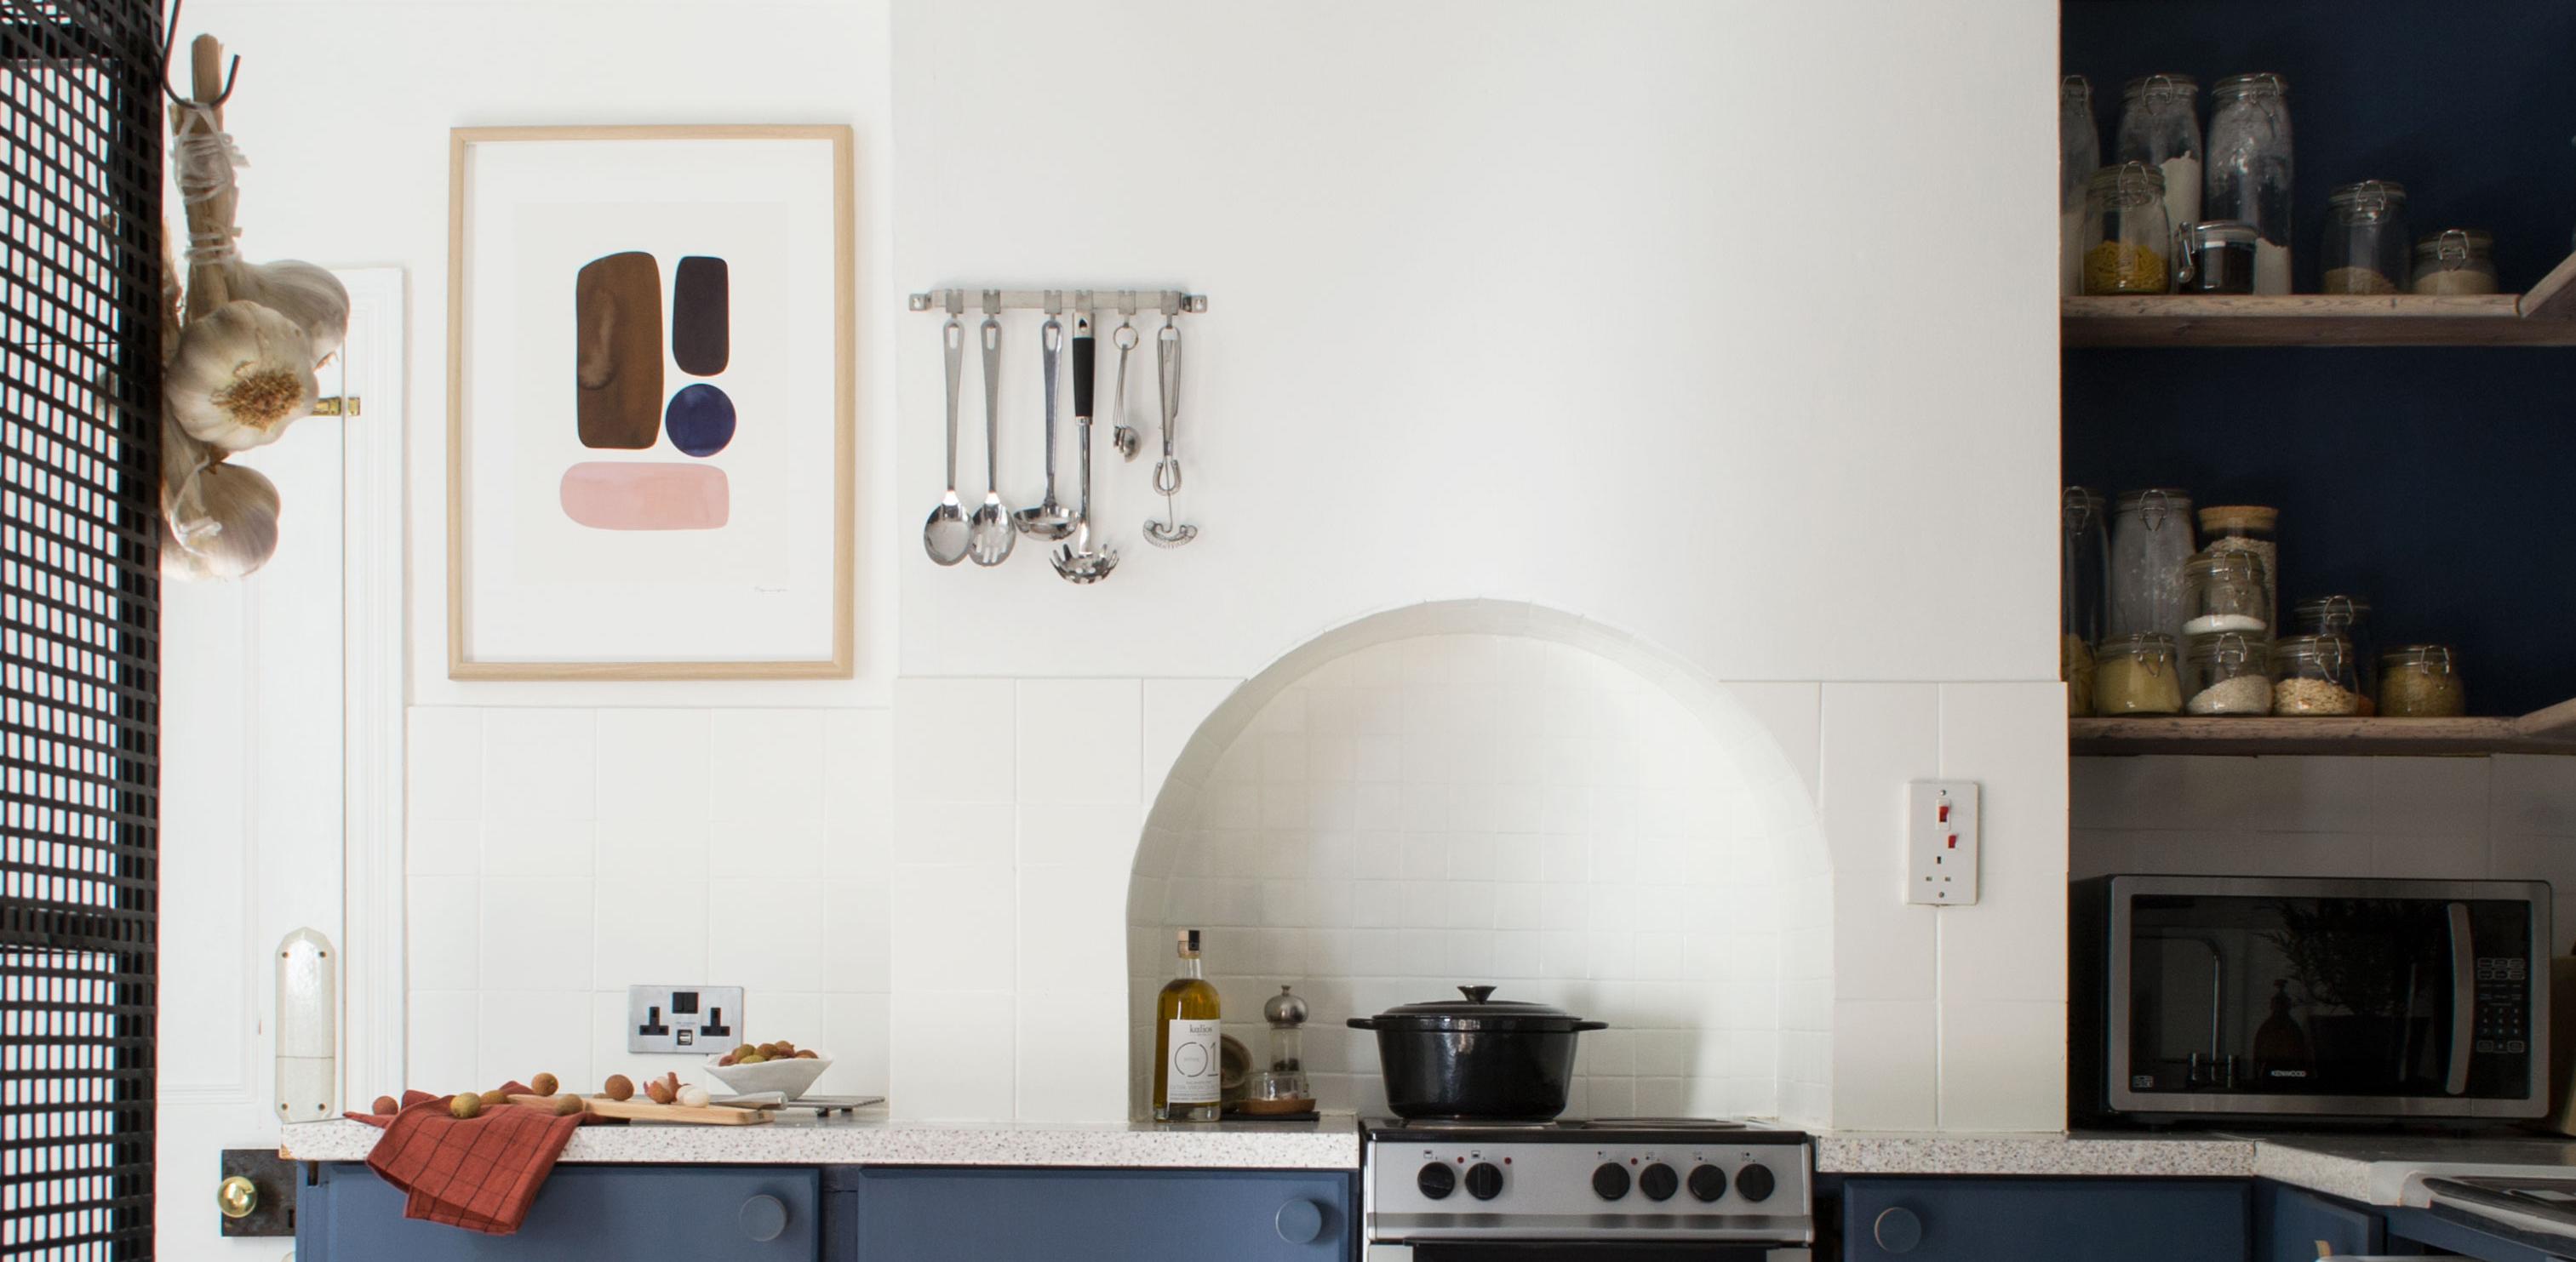 slow lifetsyle cuisine minimaliste equilibre